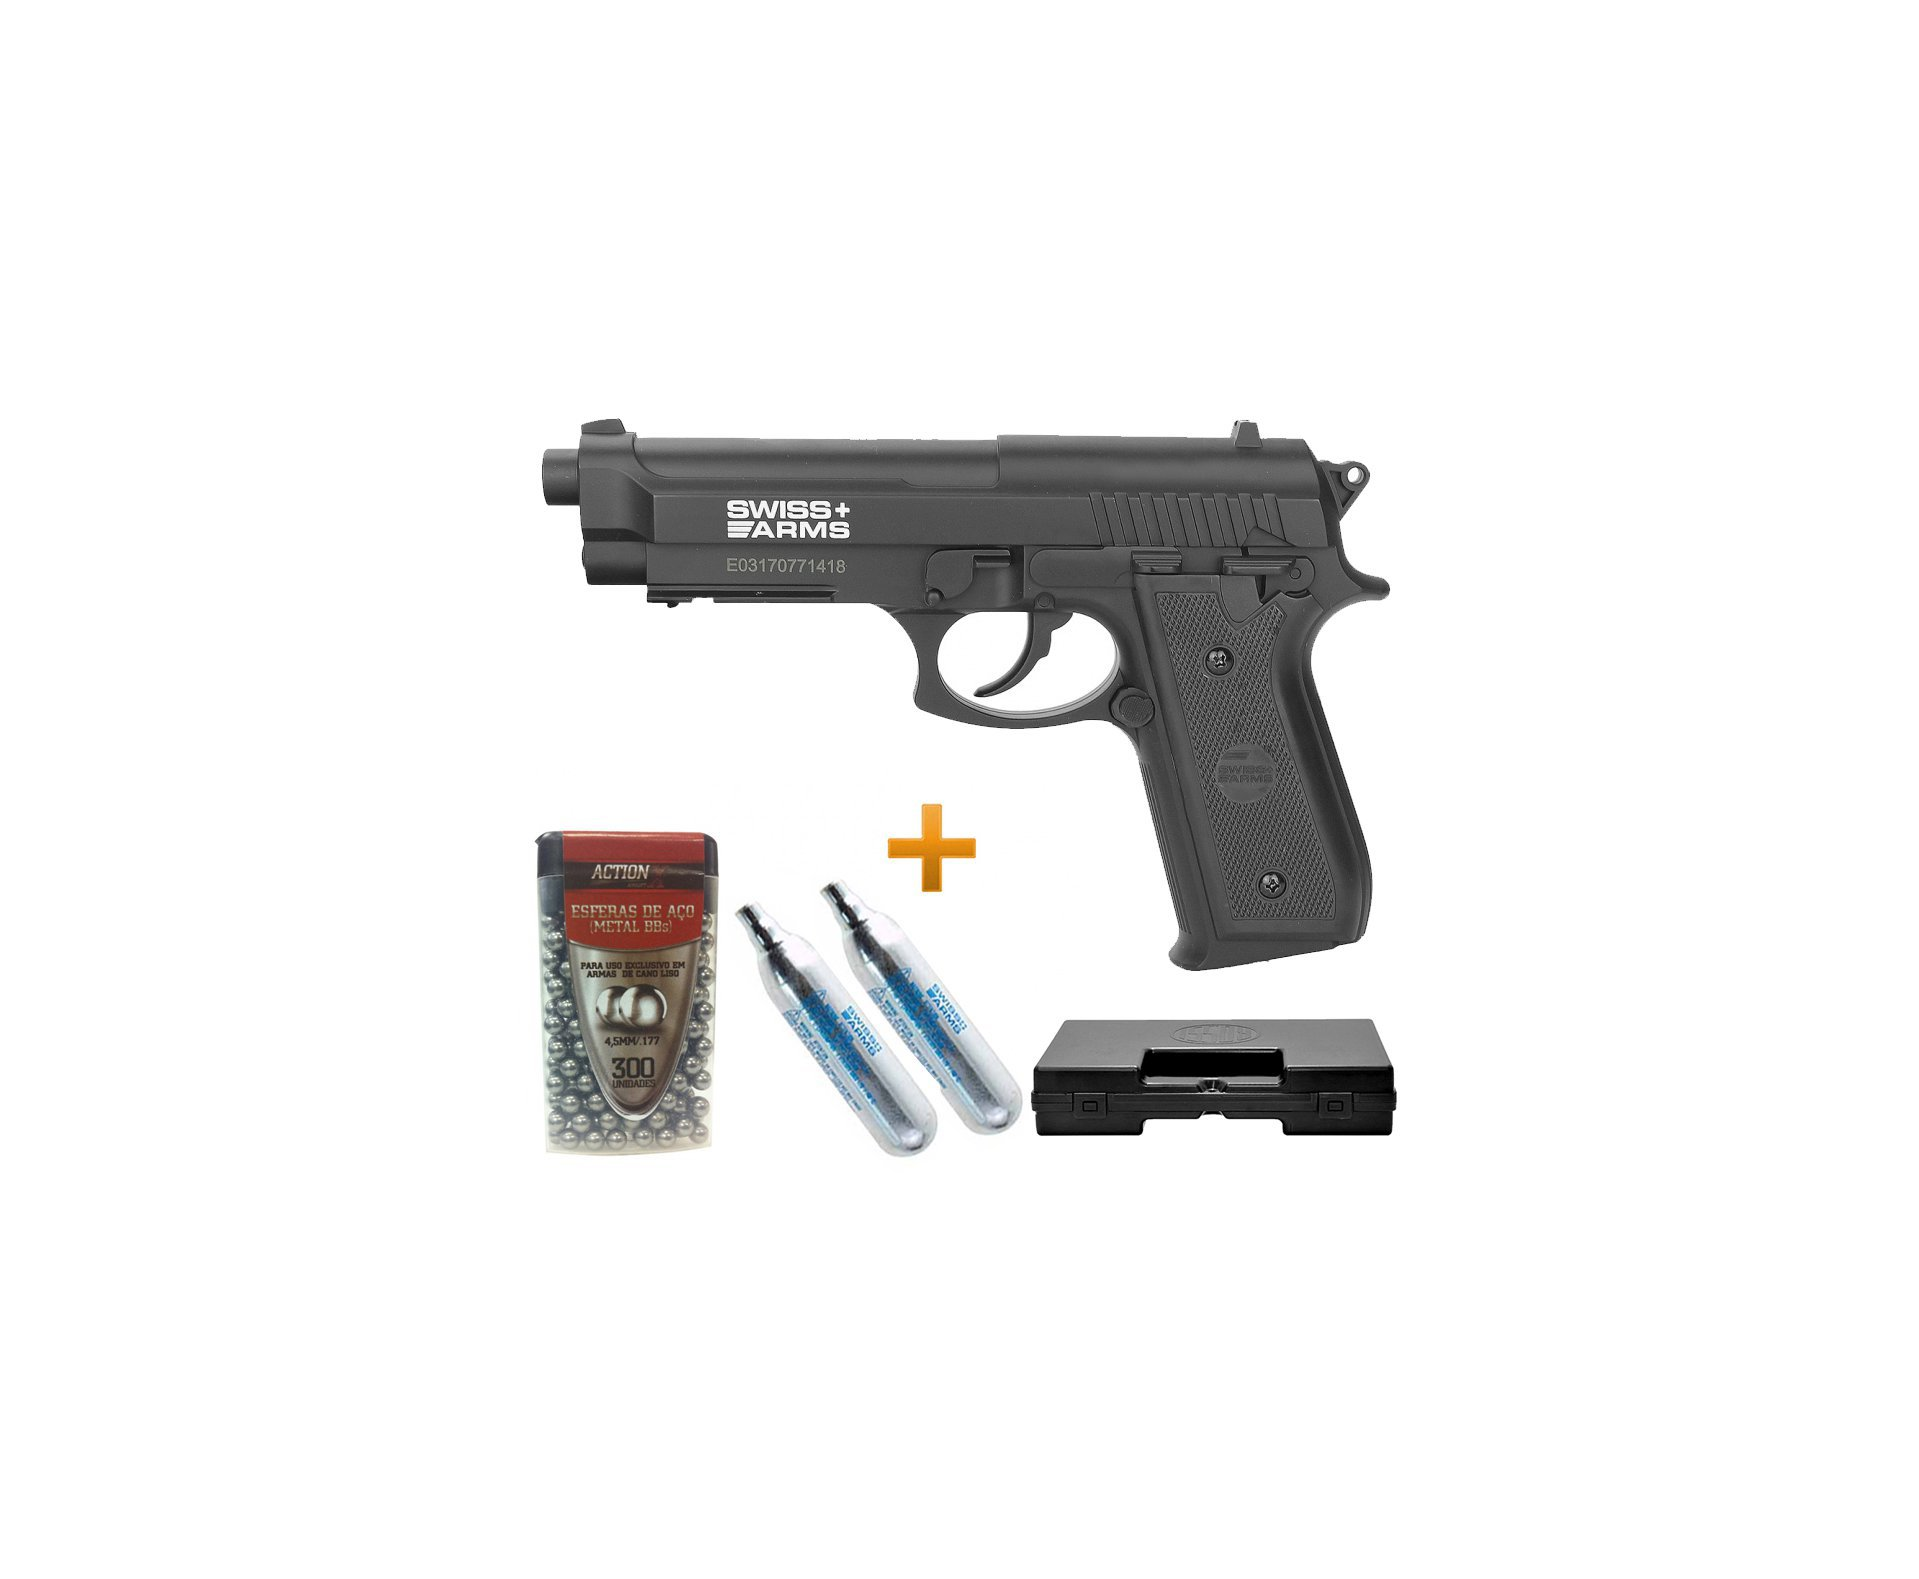 Pistola De Pressão Gas Co2 Sa P92 4.5mm Swiss Arms + Case + Bbs + Co2